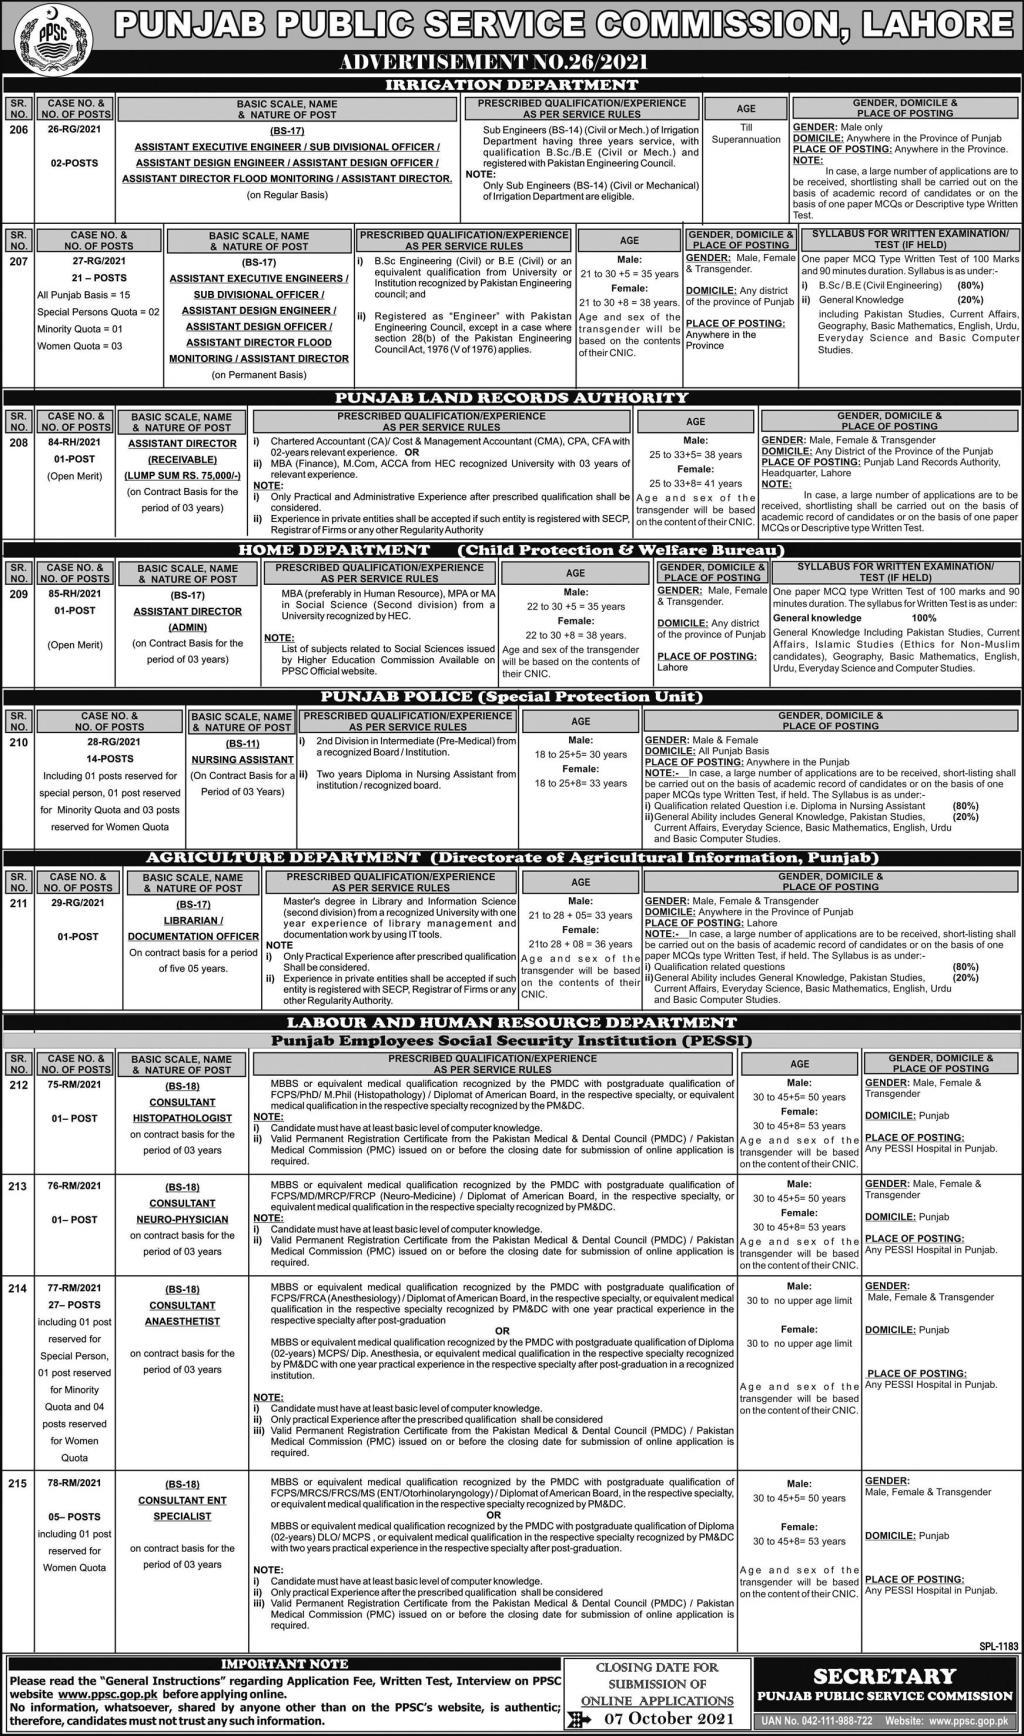 PPSC Jobs 2021 Advertisement 26/2021